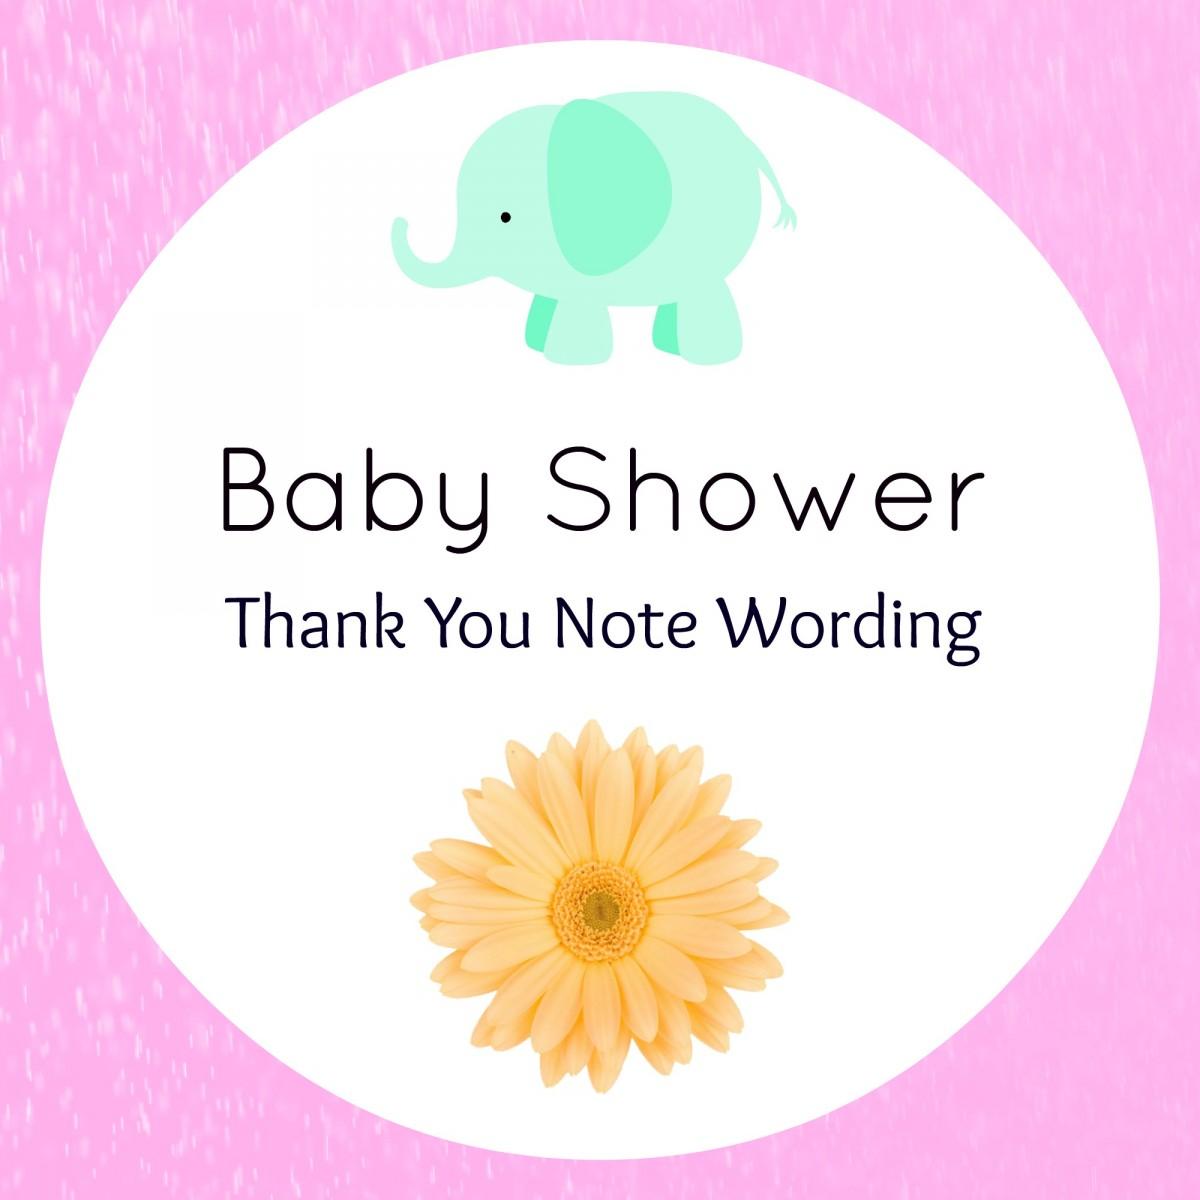 Baby Shower Thank You Wording – Handmade Gift